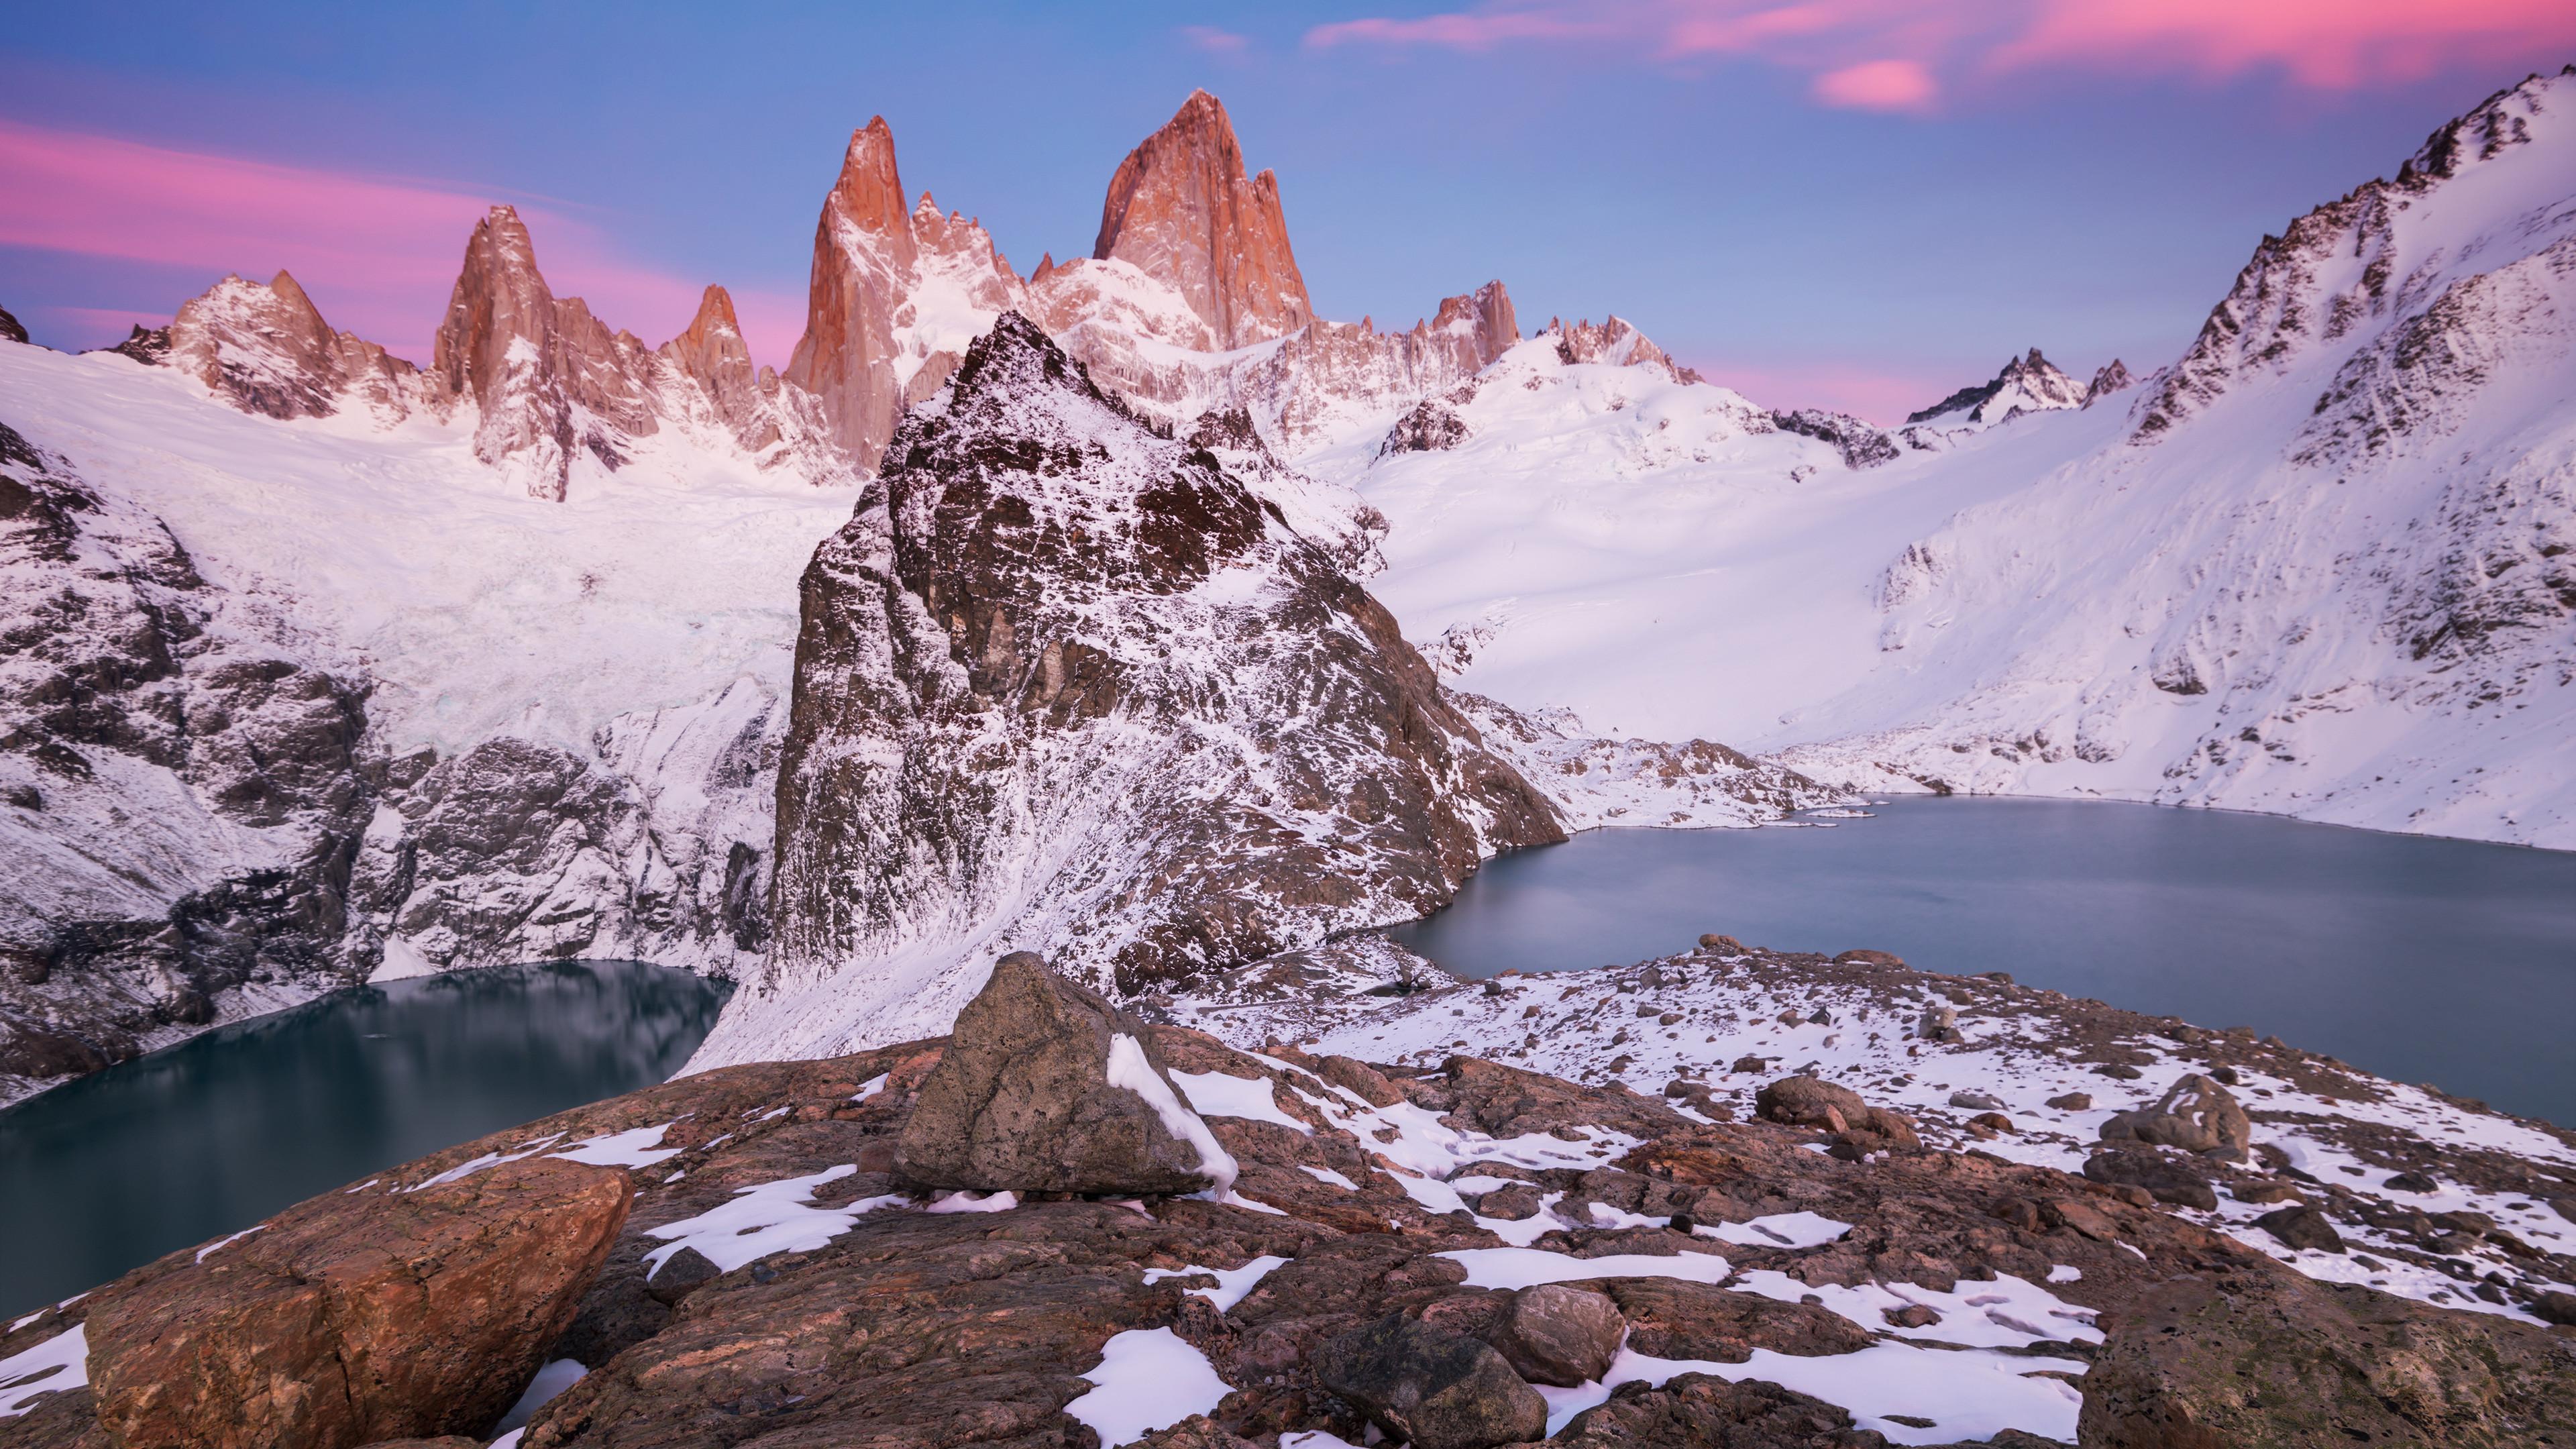 Res: 3840x2160, Snowy Mountains 4k